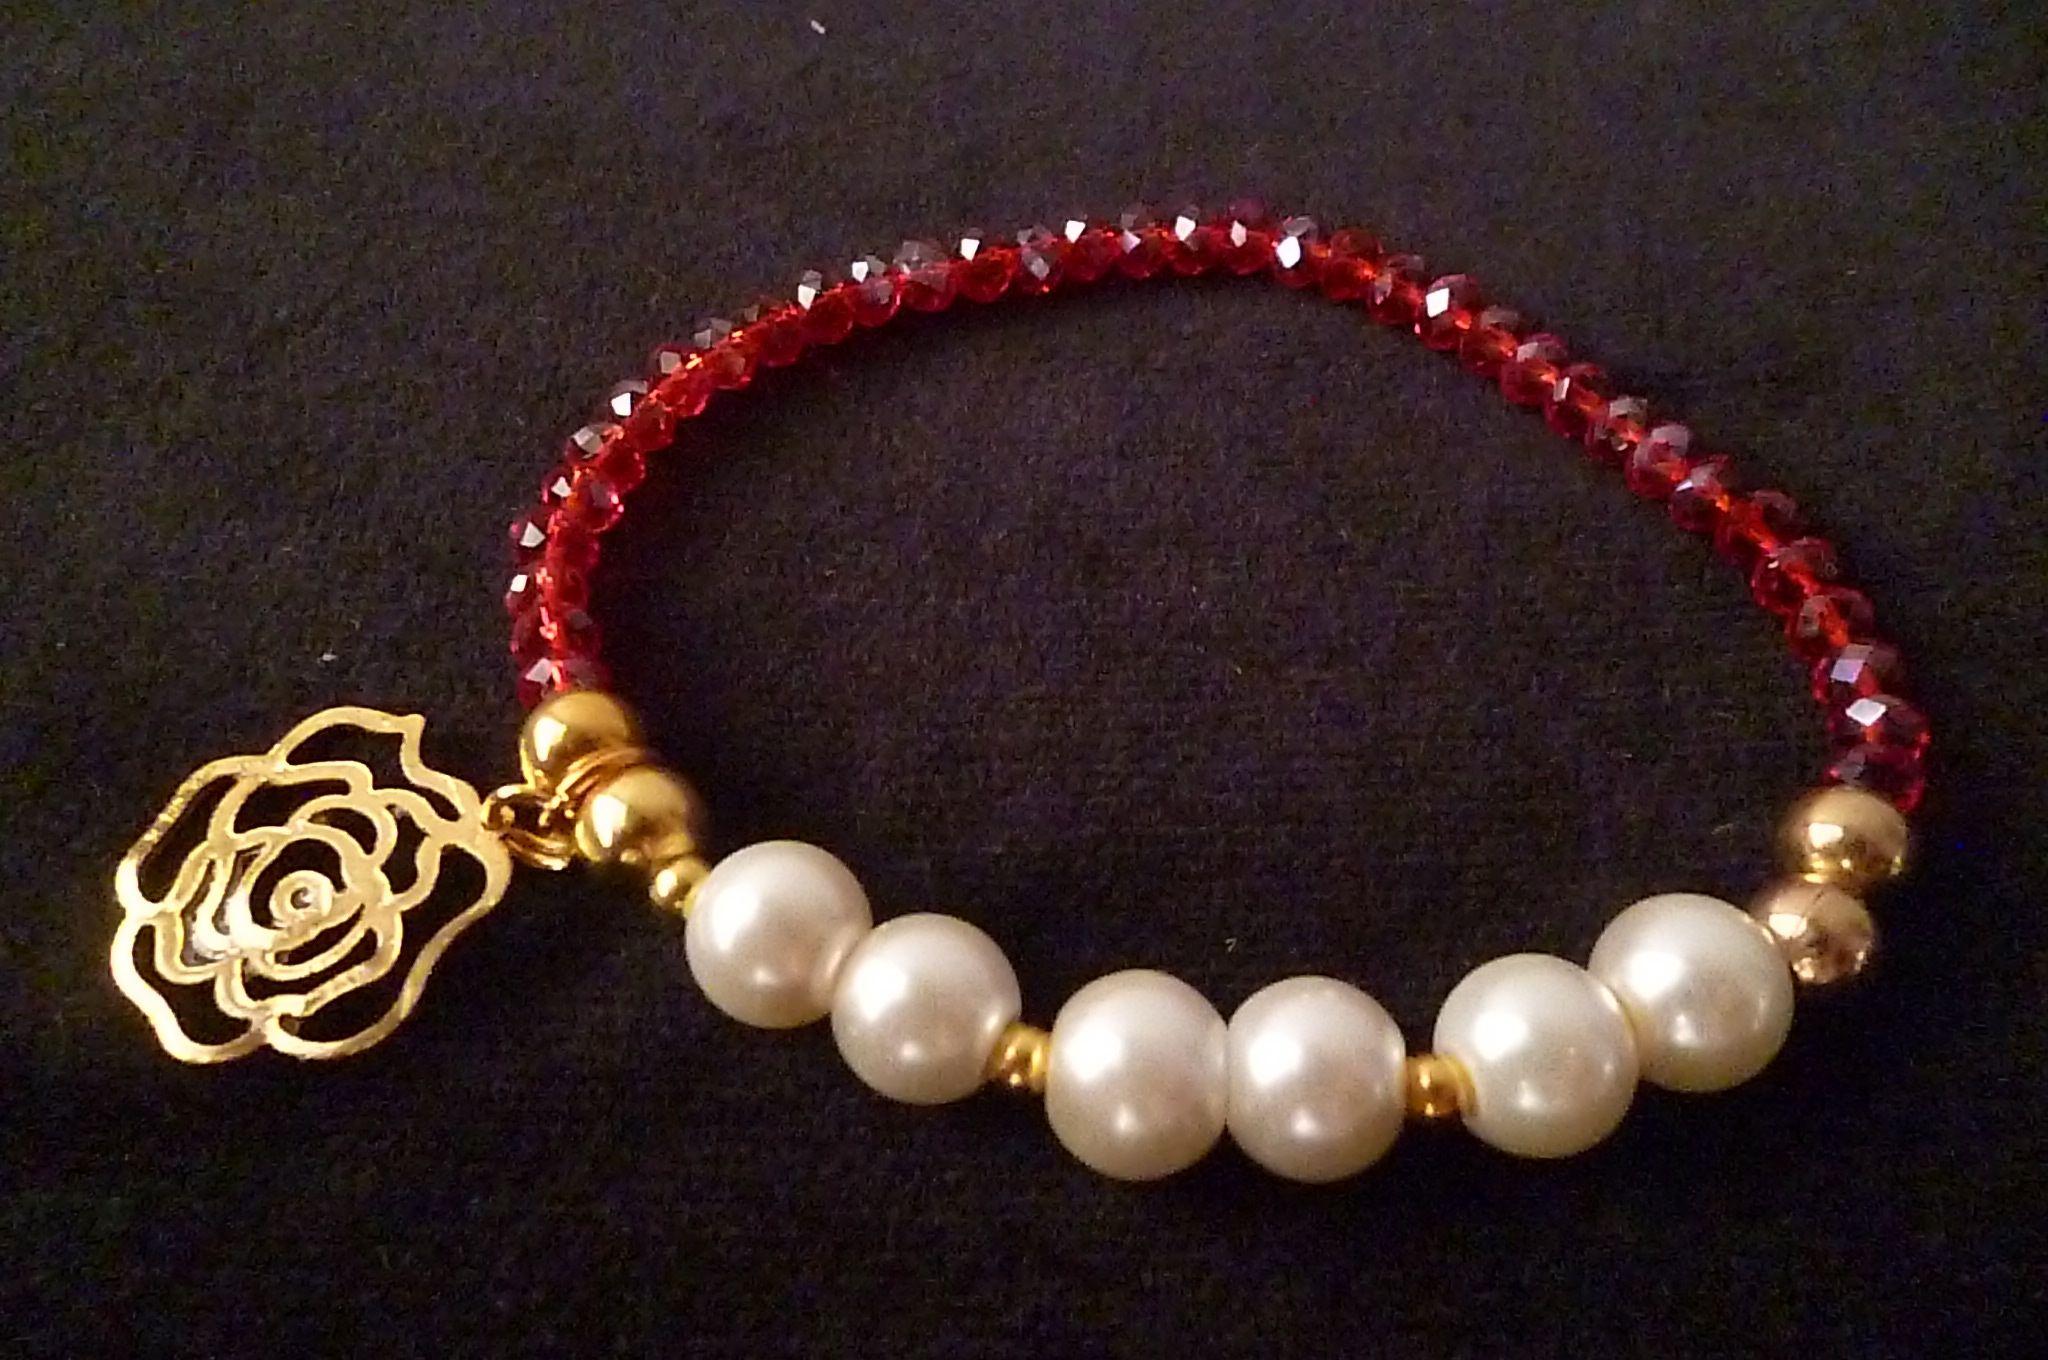 ada89e942e67 Pulsera cristal facetado 3 x 4 mm color rojo y perlas dije flor $50 ...